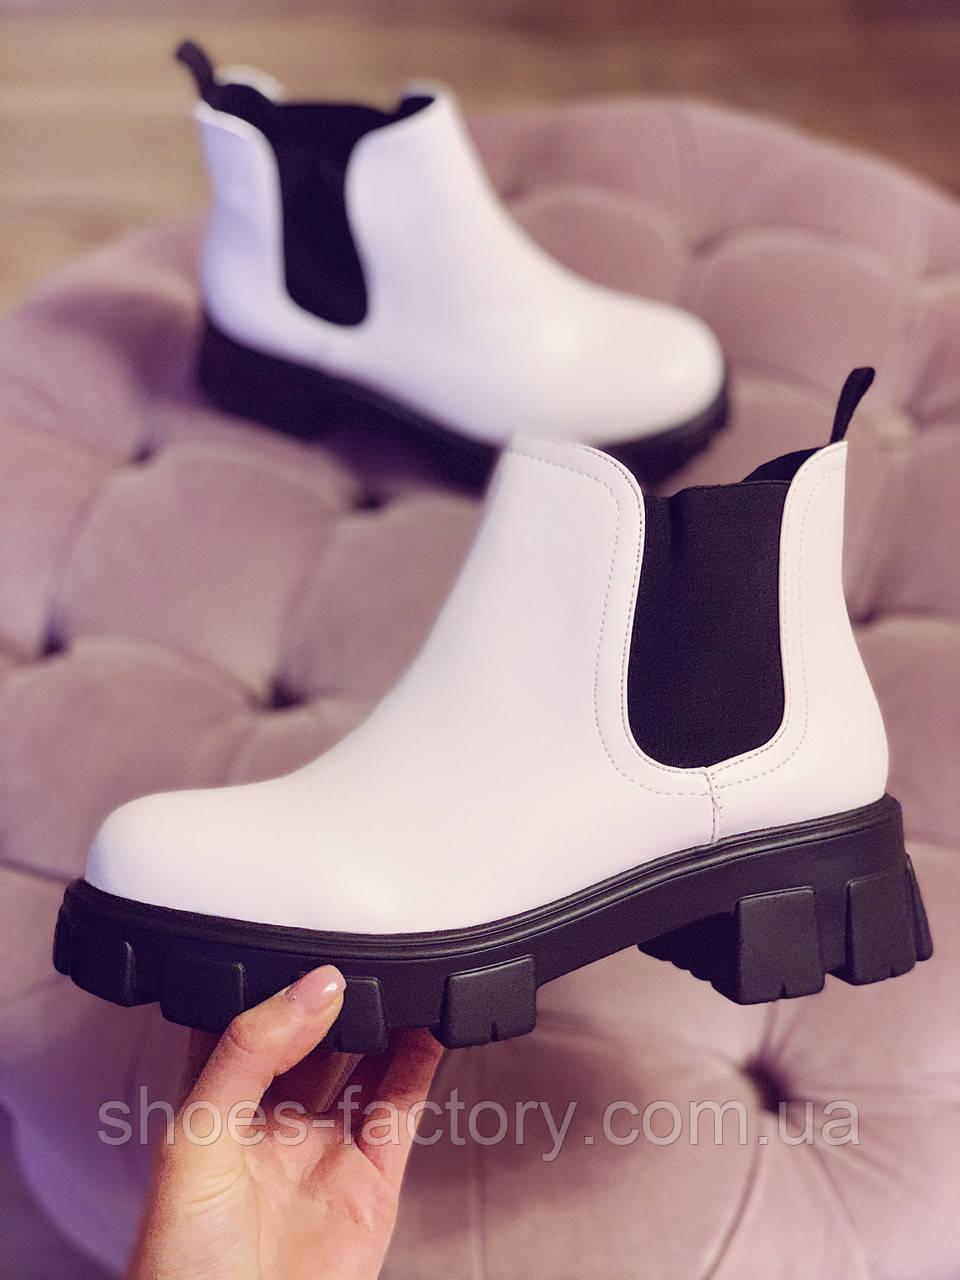 Челси CHELSEA 2020 Женские белые ботинки